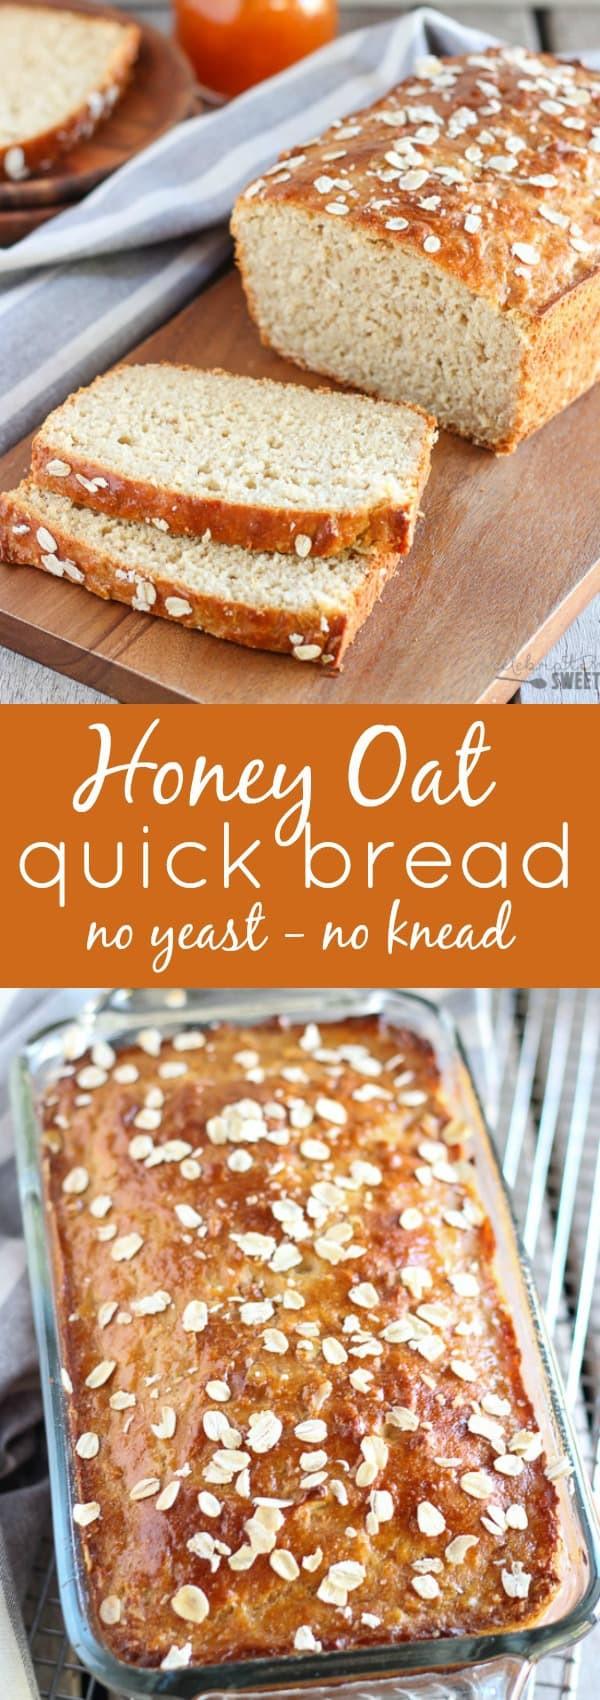 Quick Yeast Bread Recipes  Yeast Free Bread Honey Oat Quick Bread Recipe